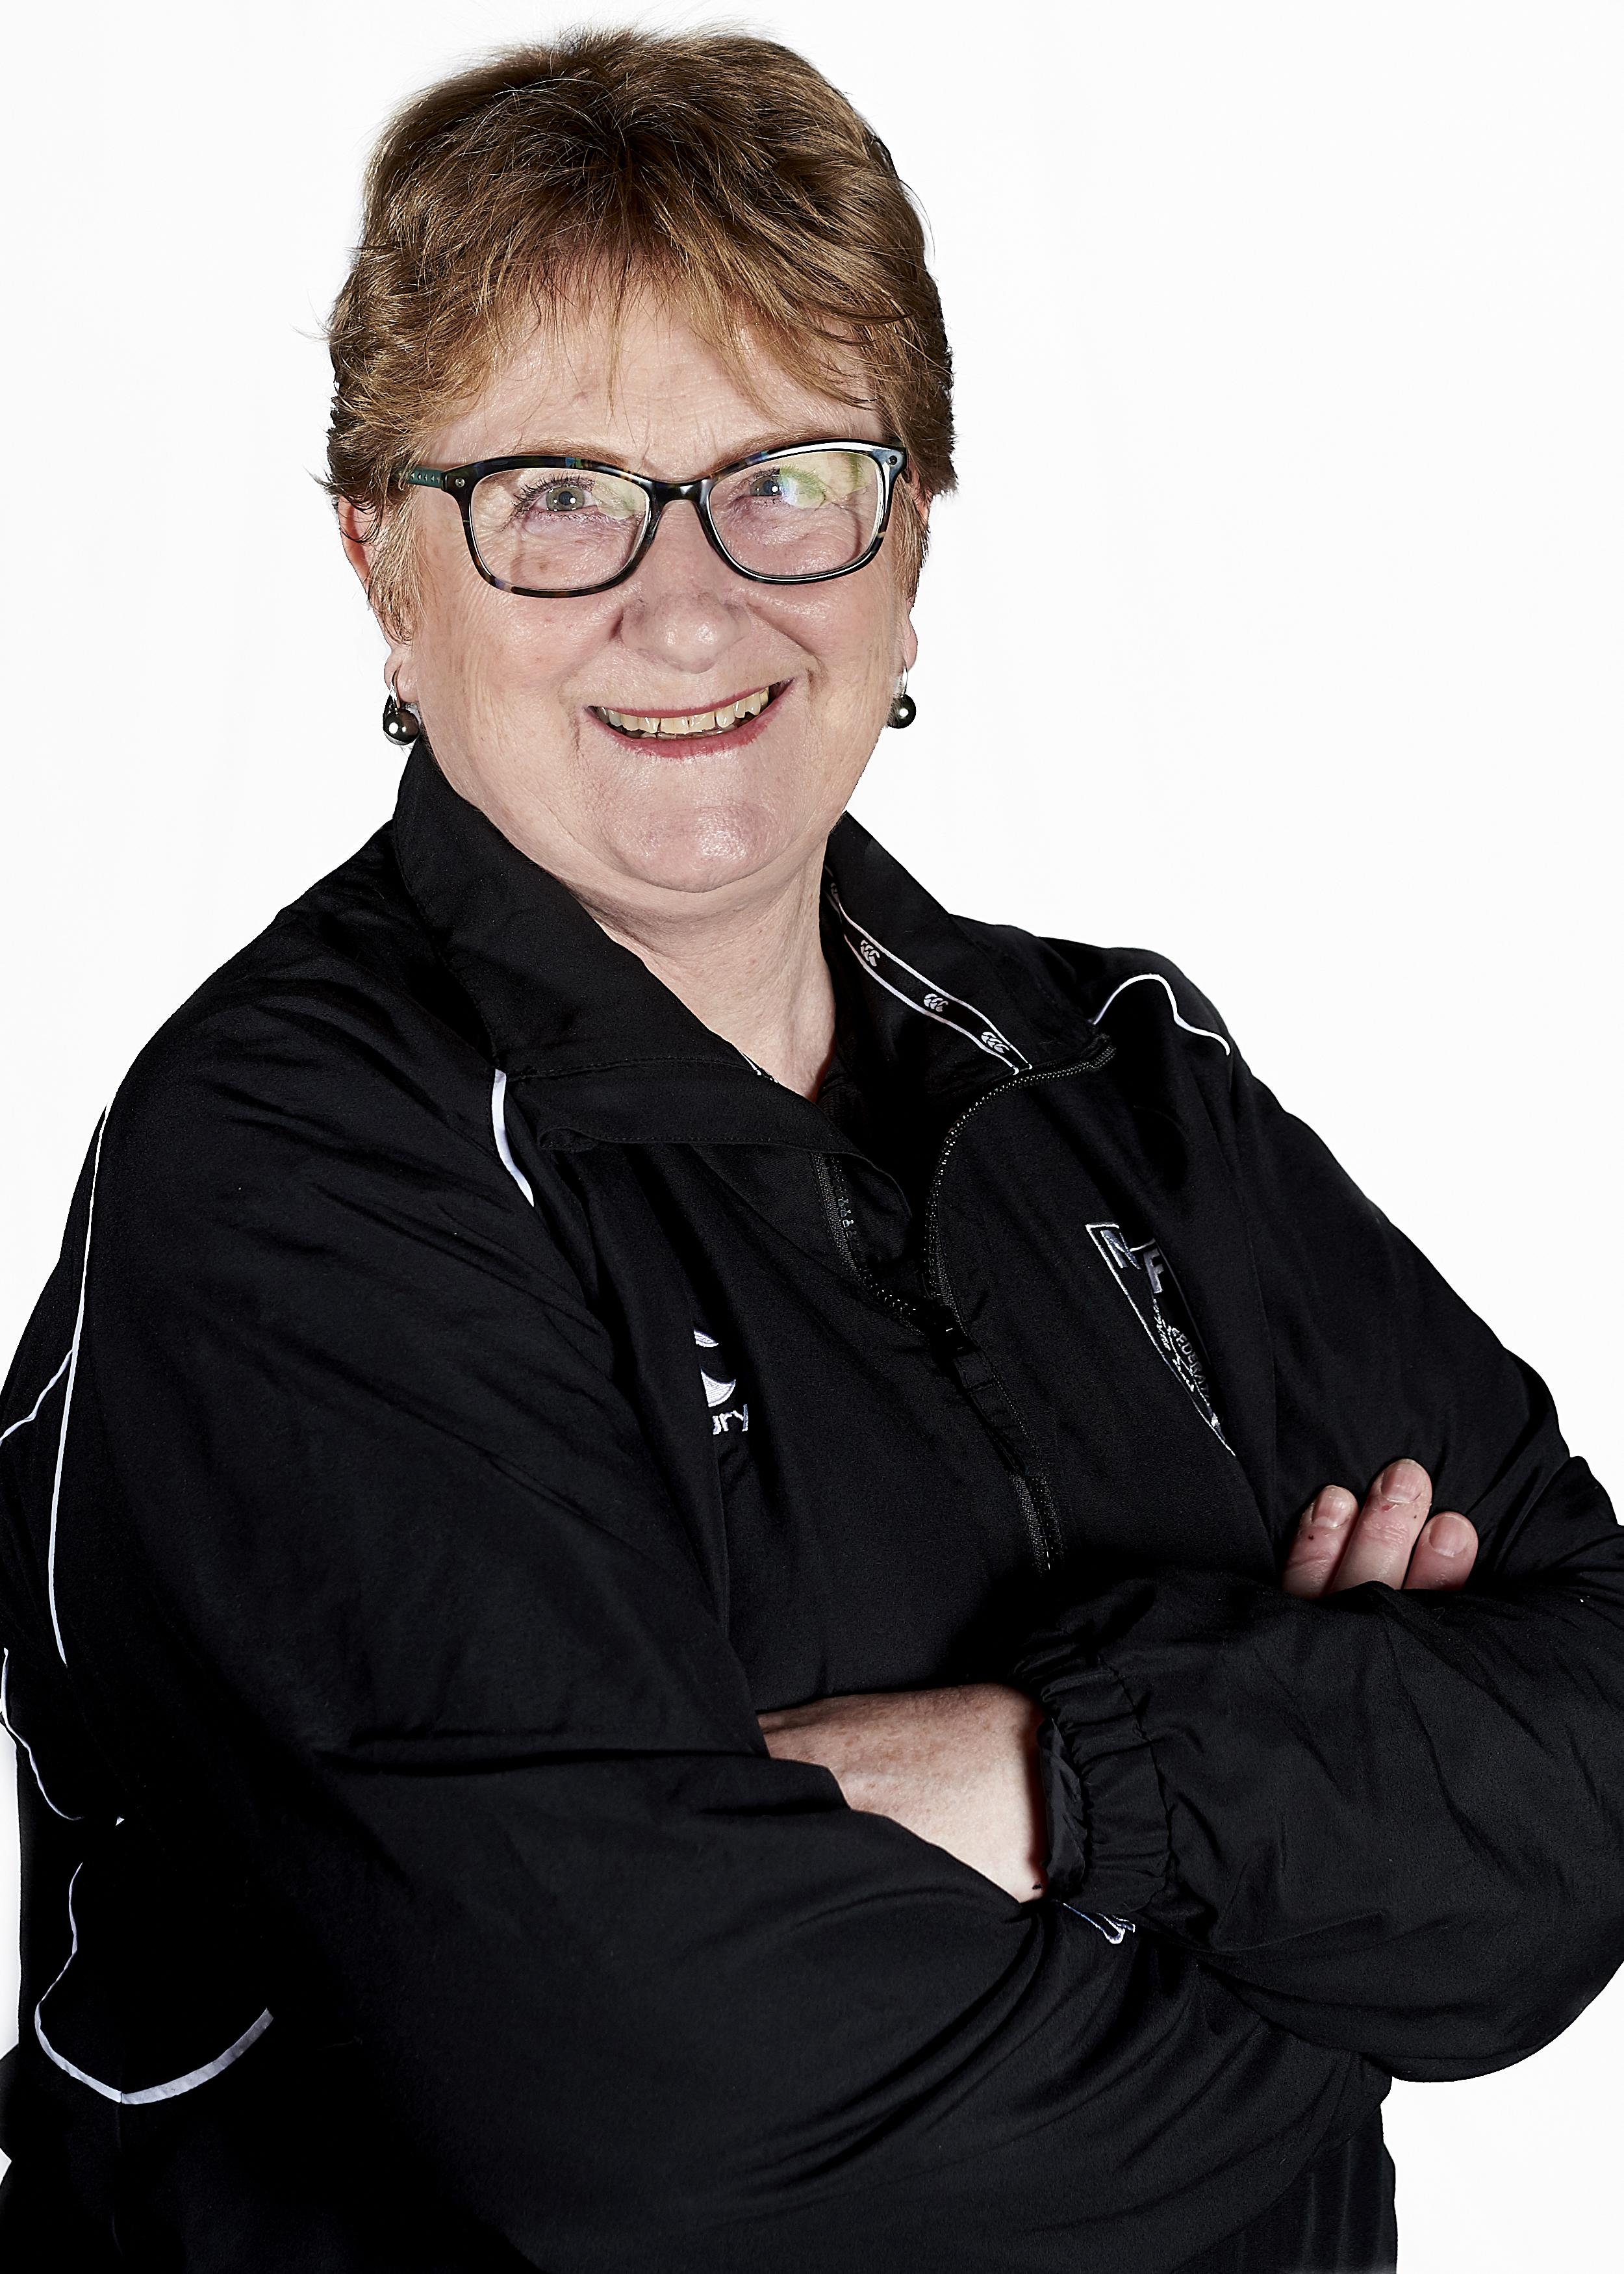 Lynda Hagen (Manager), Wellington